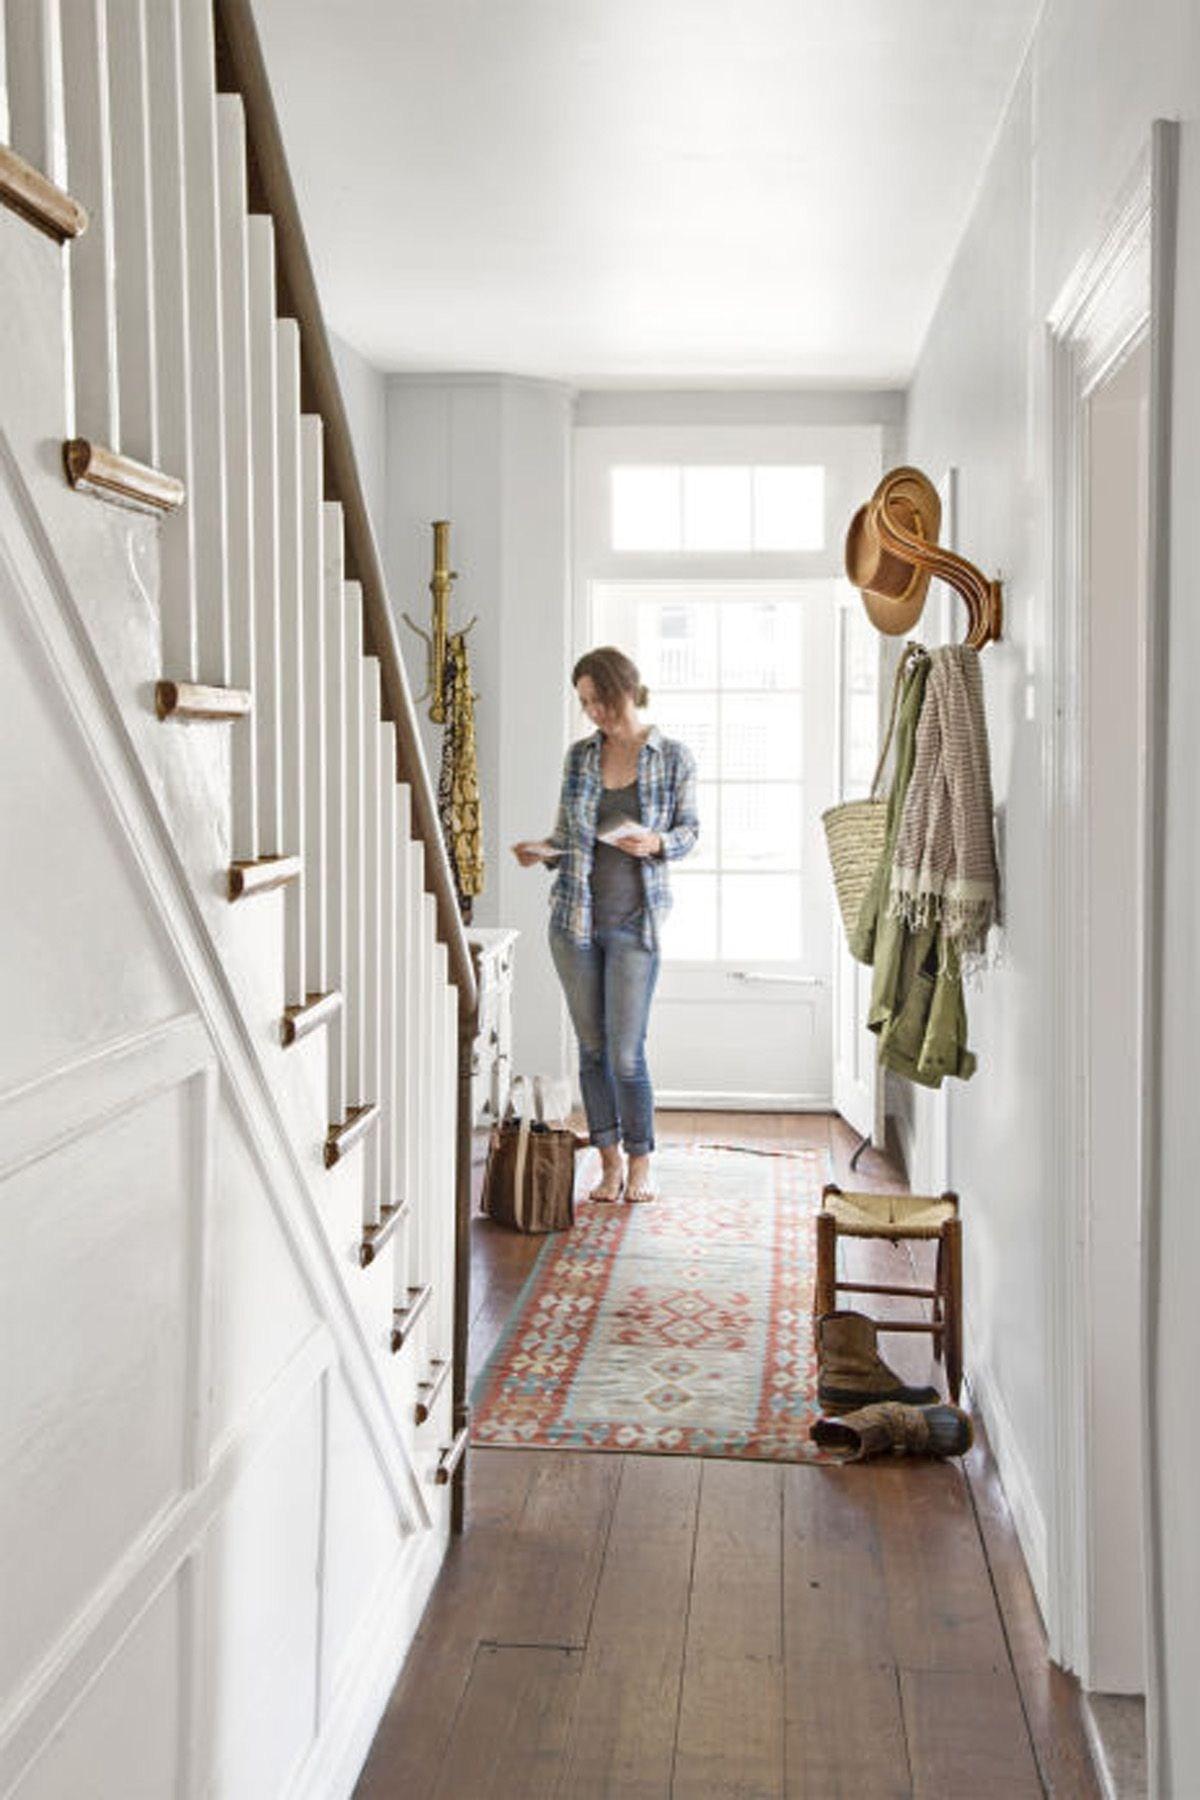 55 Best Staircase Ideas Top Ways To Decorate A Stairway | Steps Design Inside Home | Beautiful | Wooden | Ultra Modern | Sala | Behind Duplex